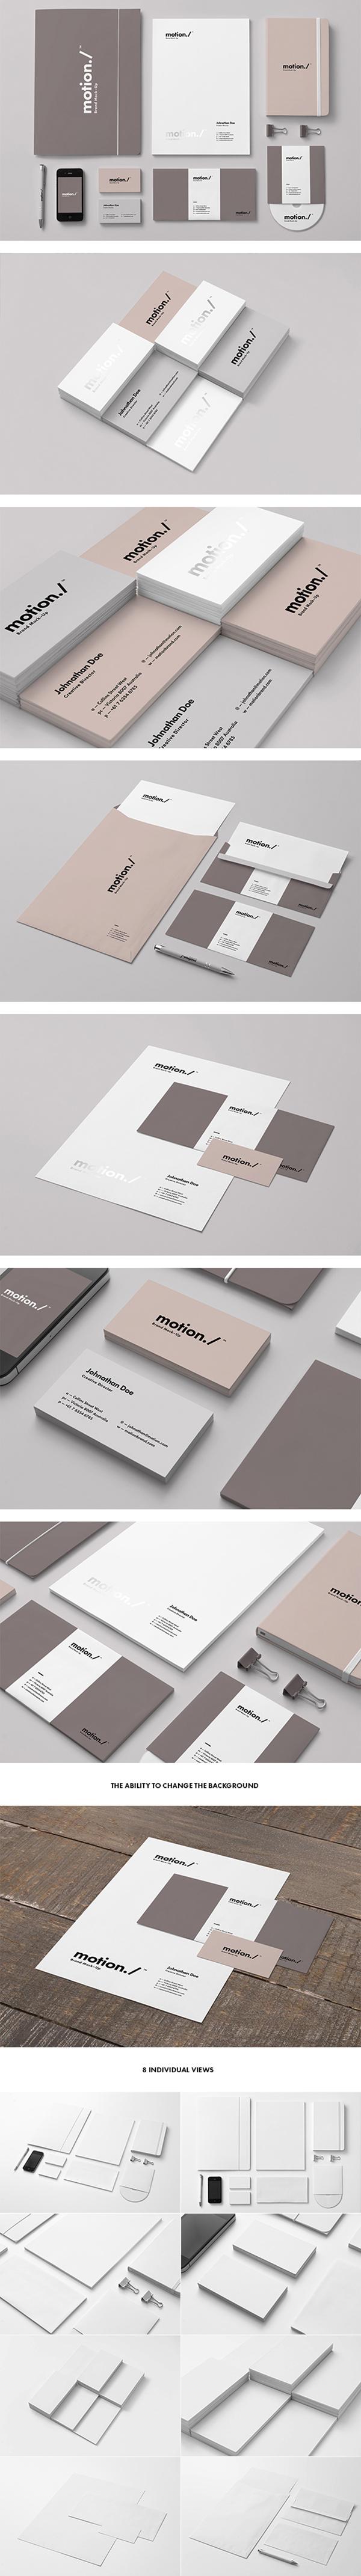 04 Branding : Identity Mock-up